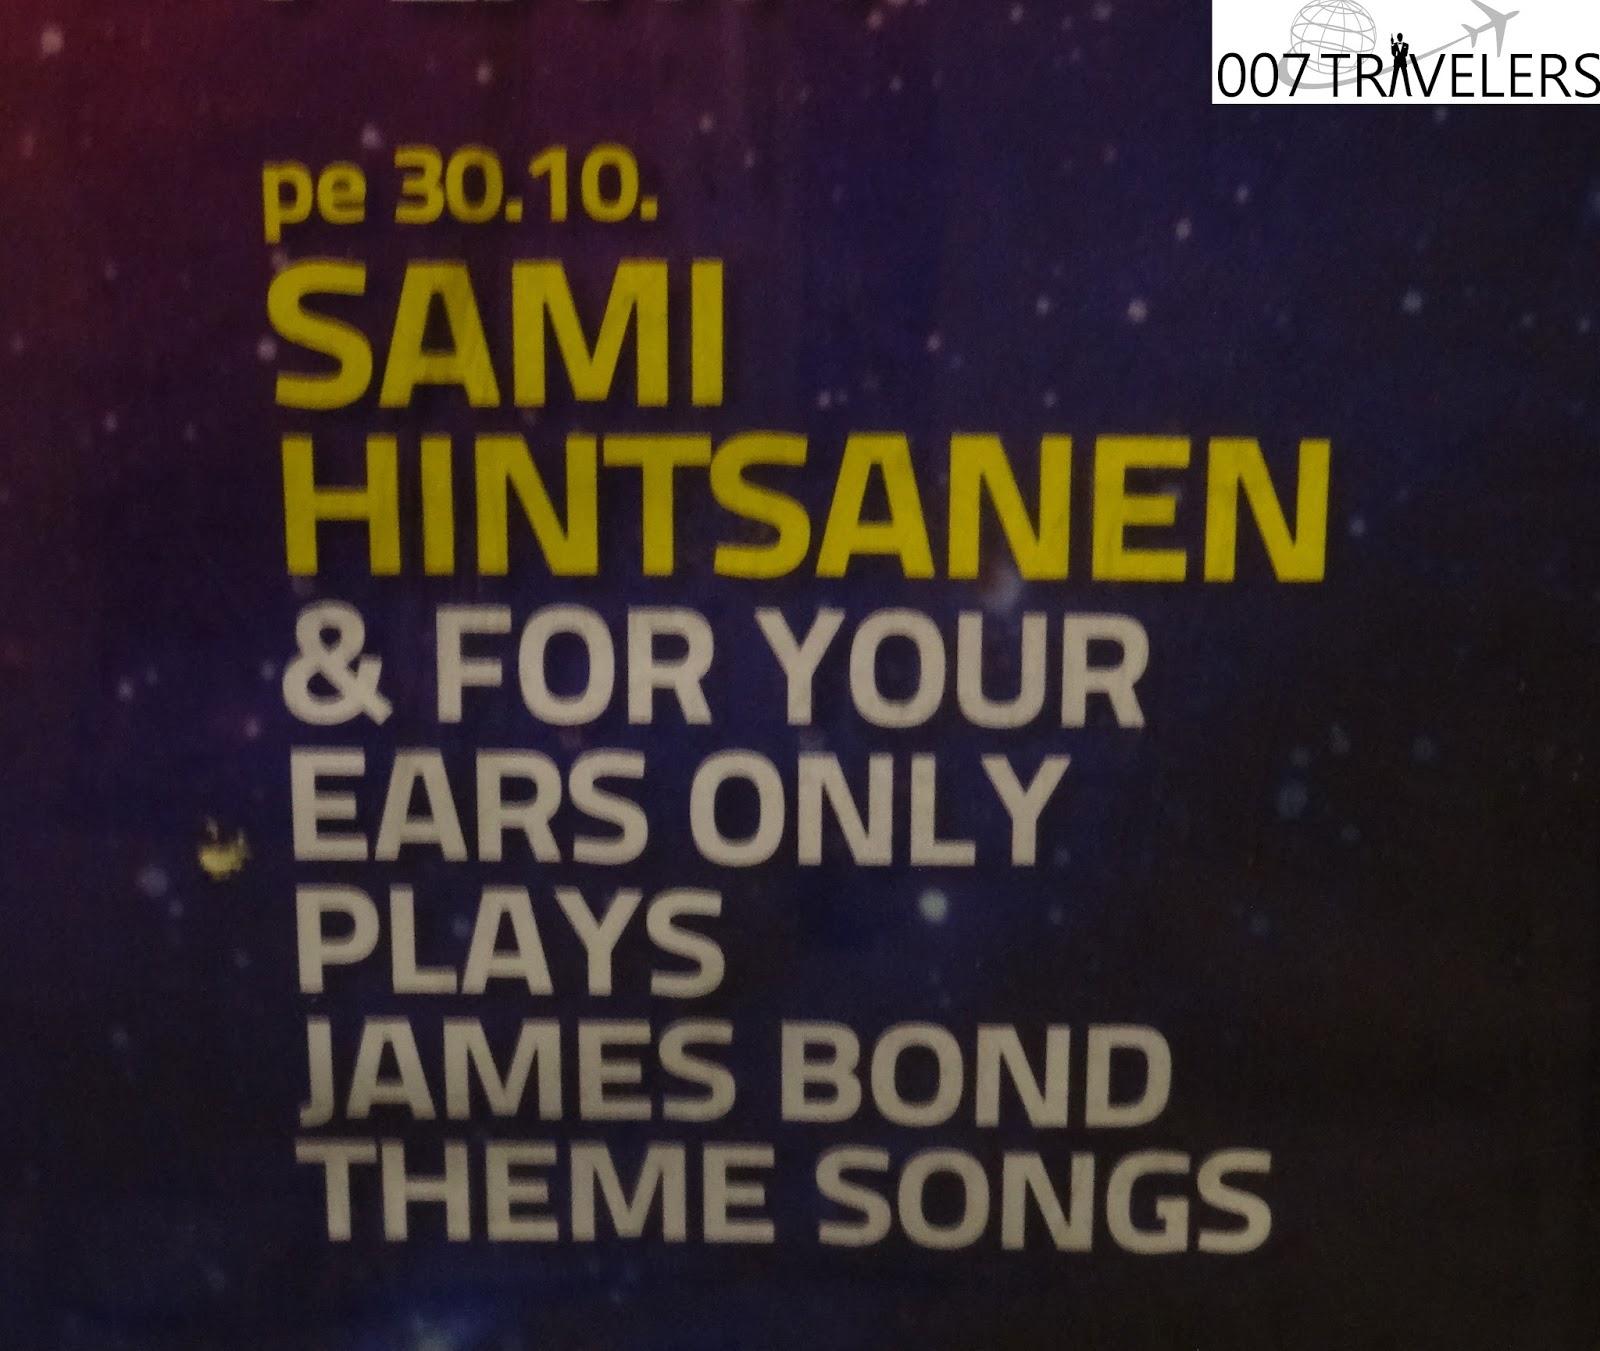 007 TRAVELERS: 007 Travelers report of 007 theme night at